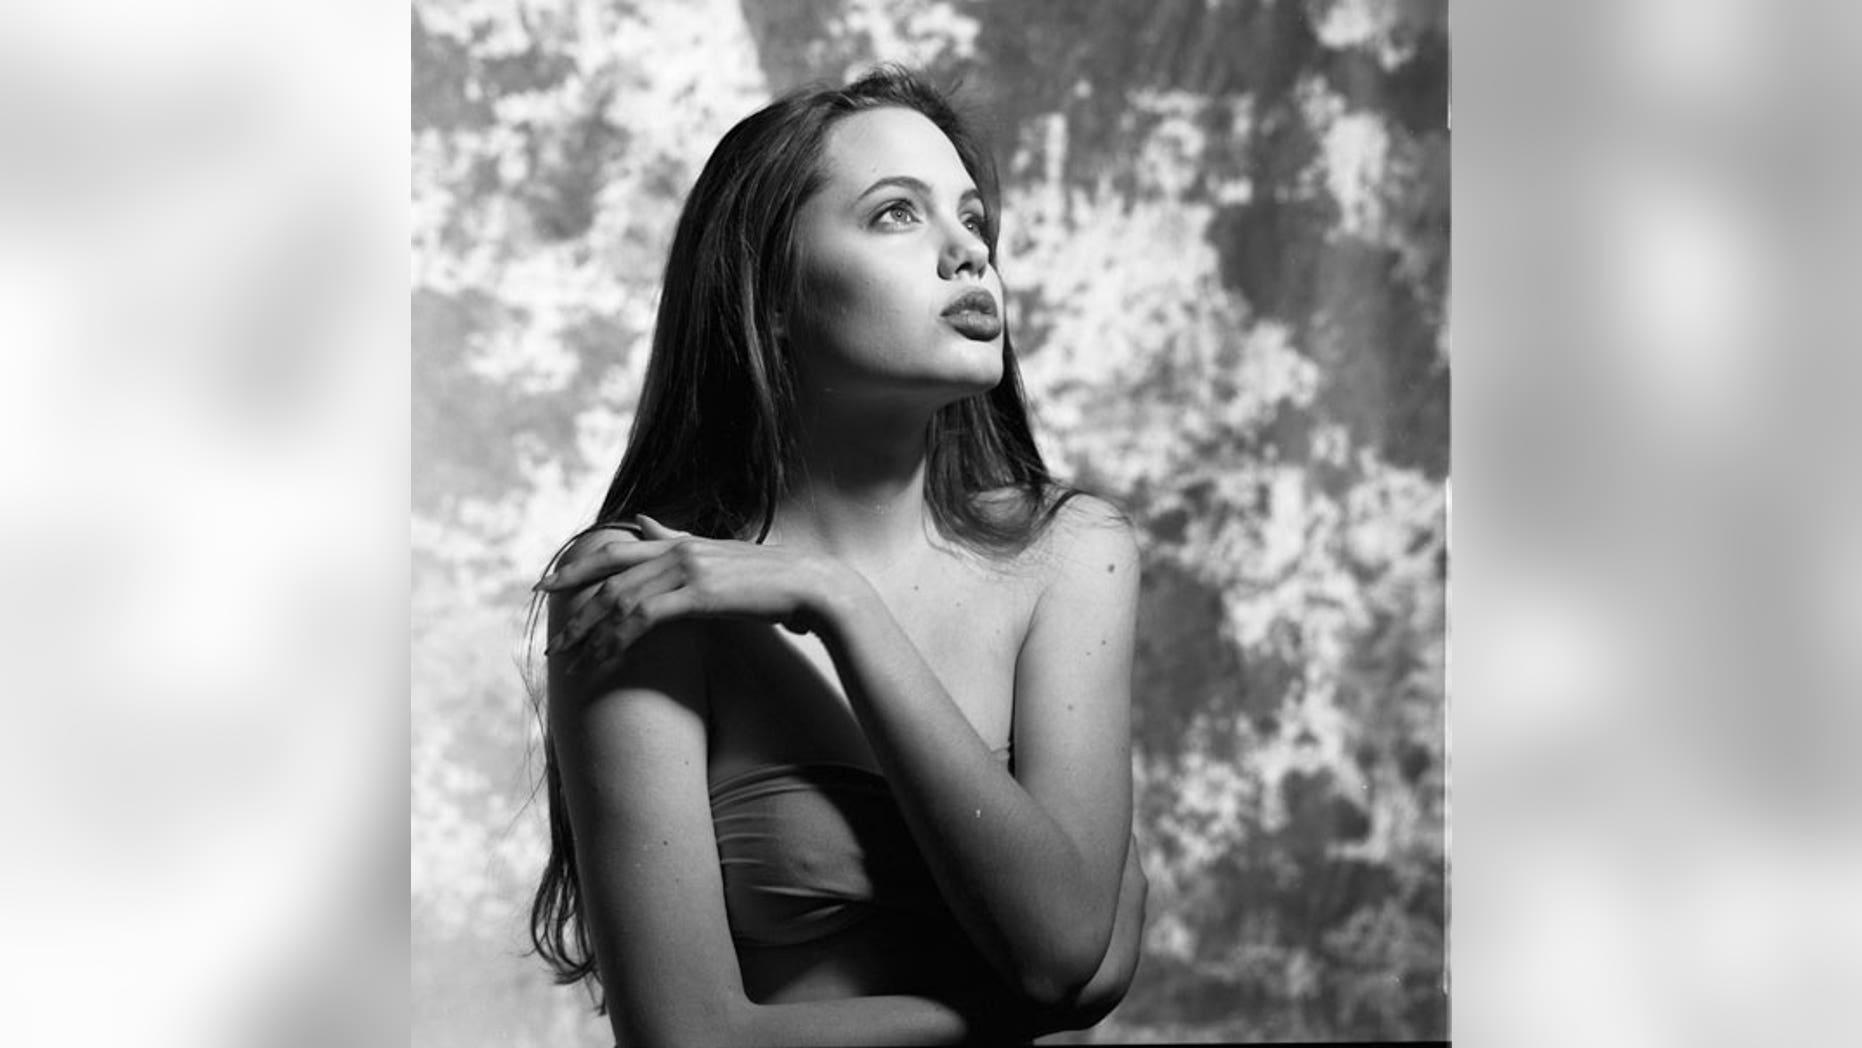 Angelina Jolie Teenage Modeling Photos Surface; Star Poses